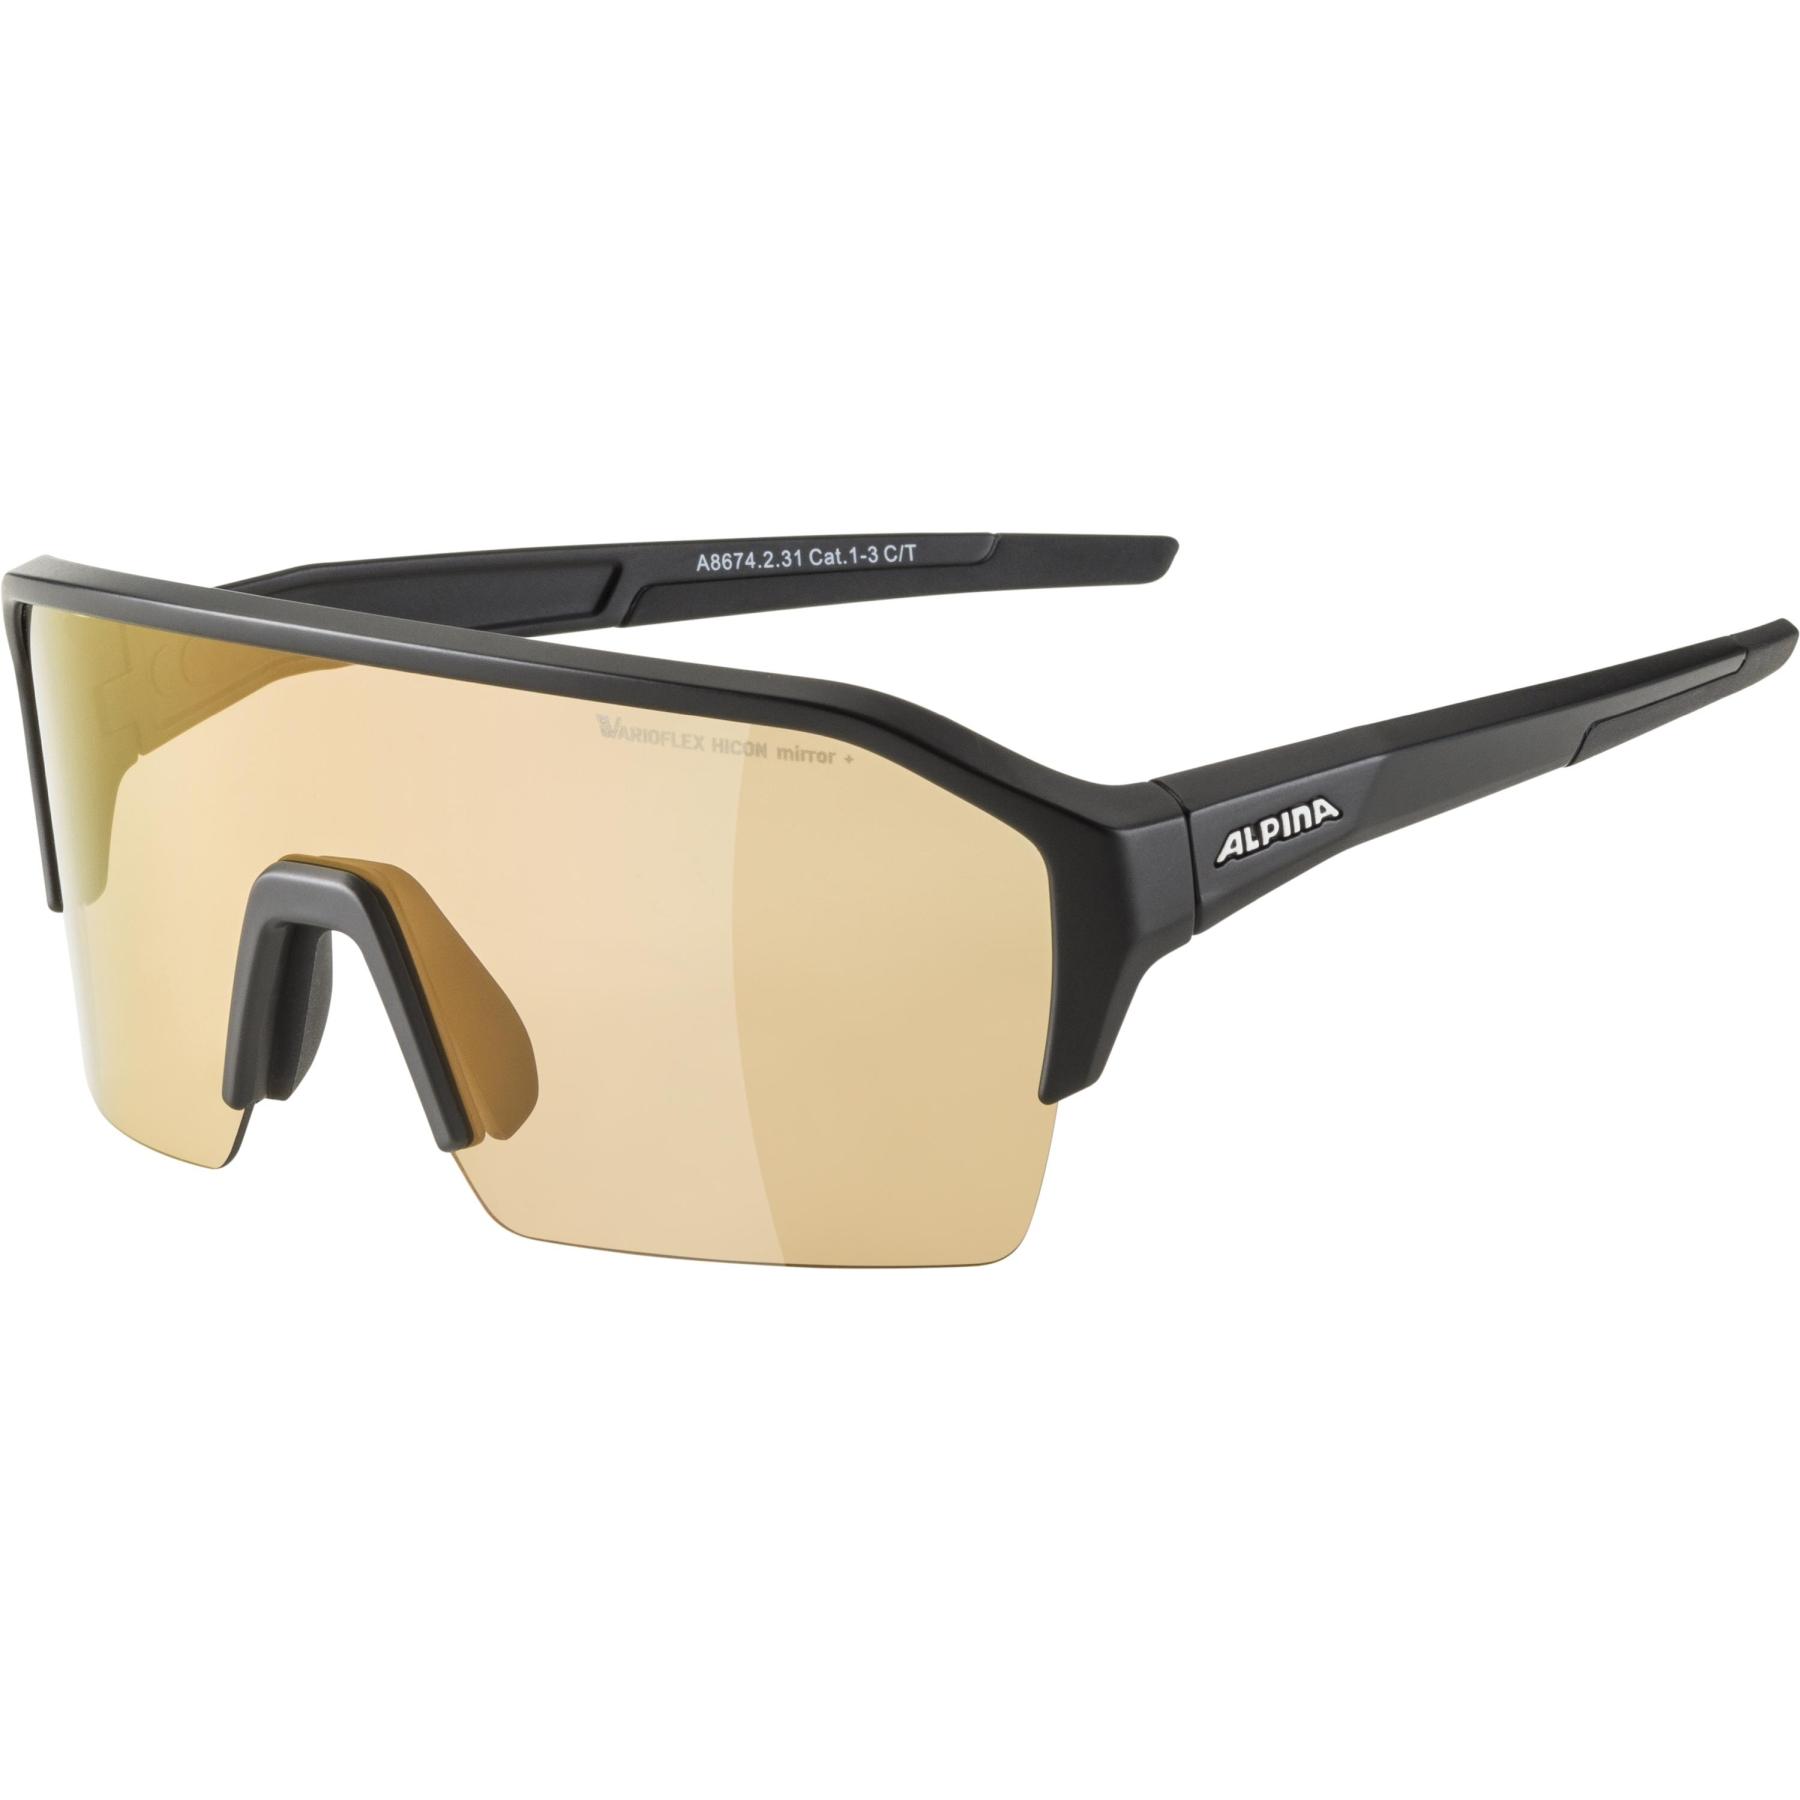 Alpina Ram HR HVLM+ Glasses - black matt / Hicon Varioflex silver mirror